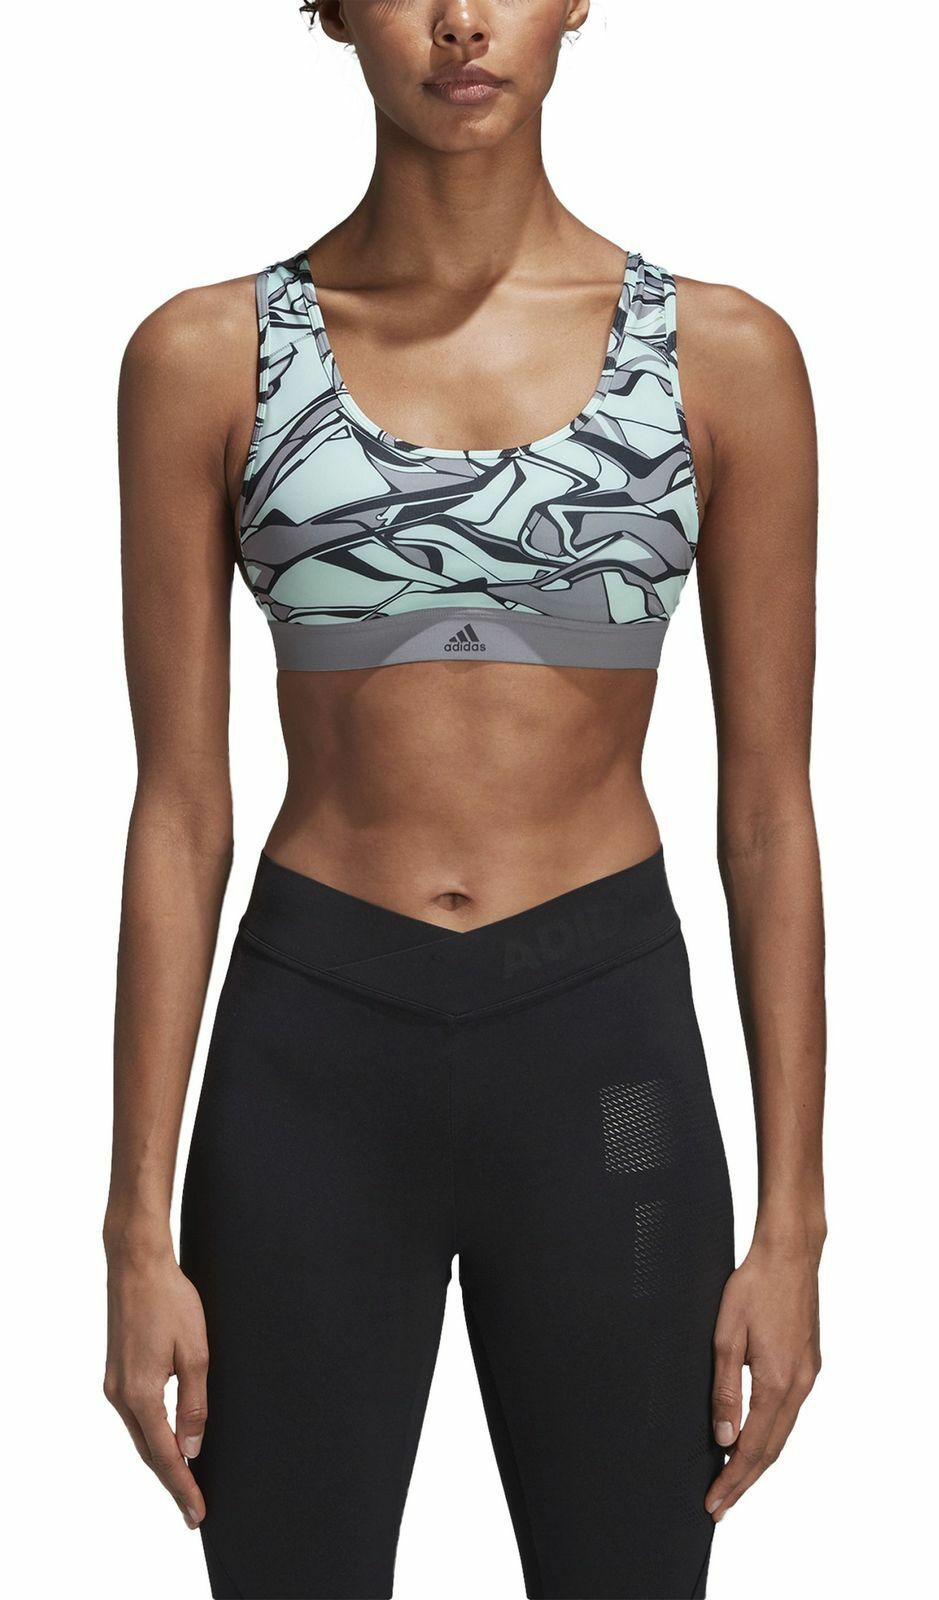 Adidas Performance Αθλητικά γυναικΡία αθλητικά υποδΞ�ματα Dont Rest x Gr2 Green Grey